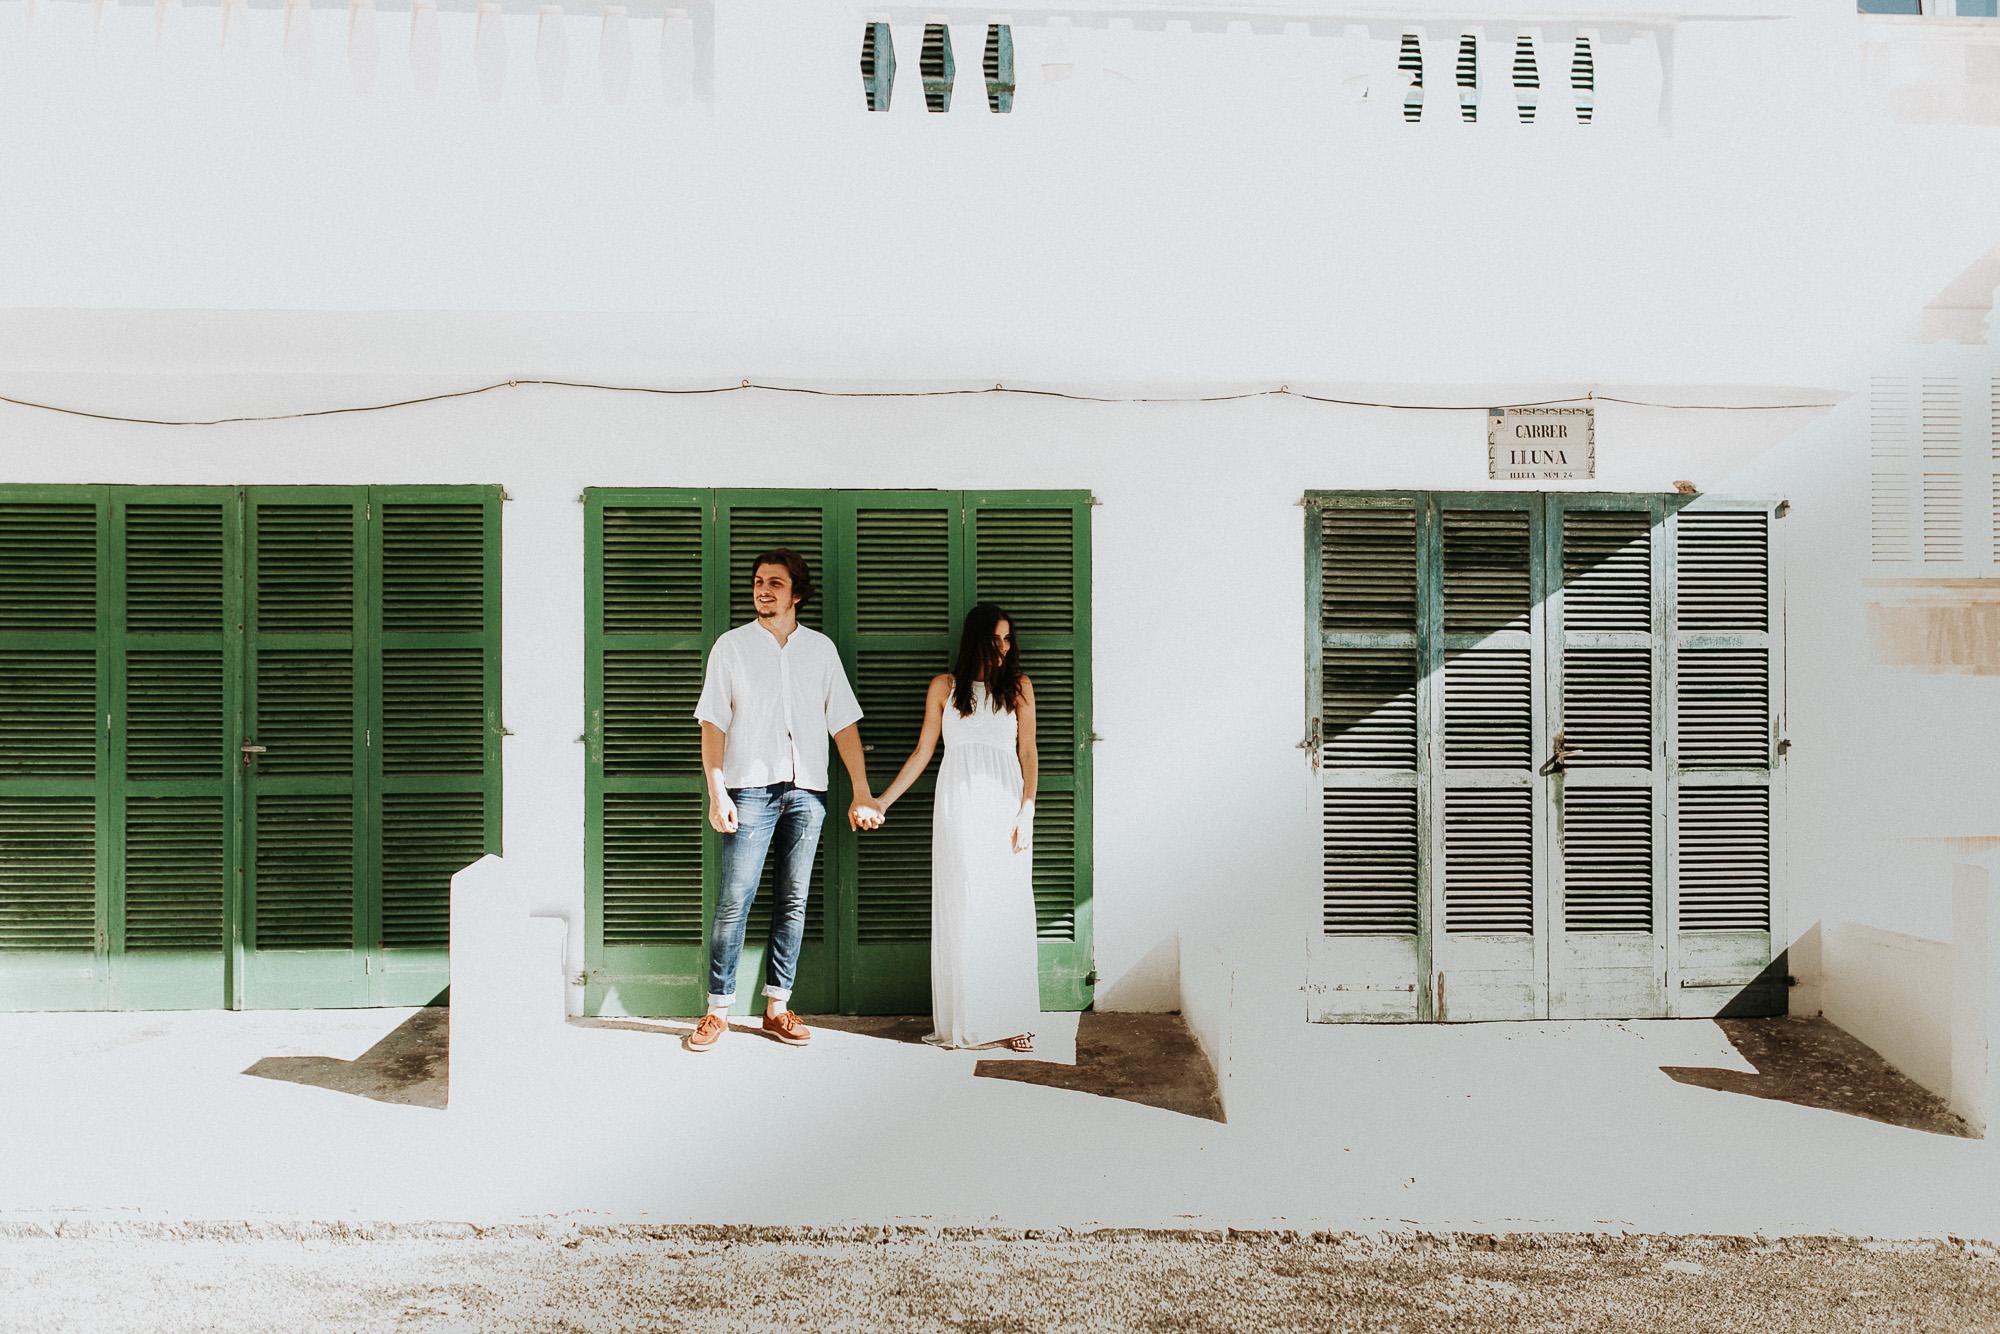 DanielaMarquardtPhotography_wedding_elopement_mallorca_spain_stjordi_sessalines_marinaandxavi450